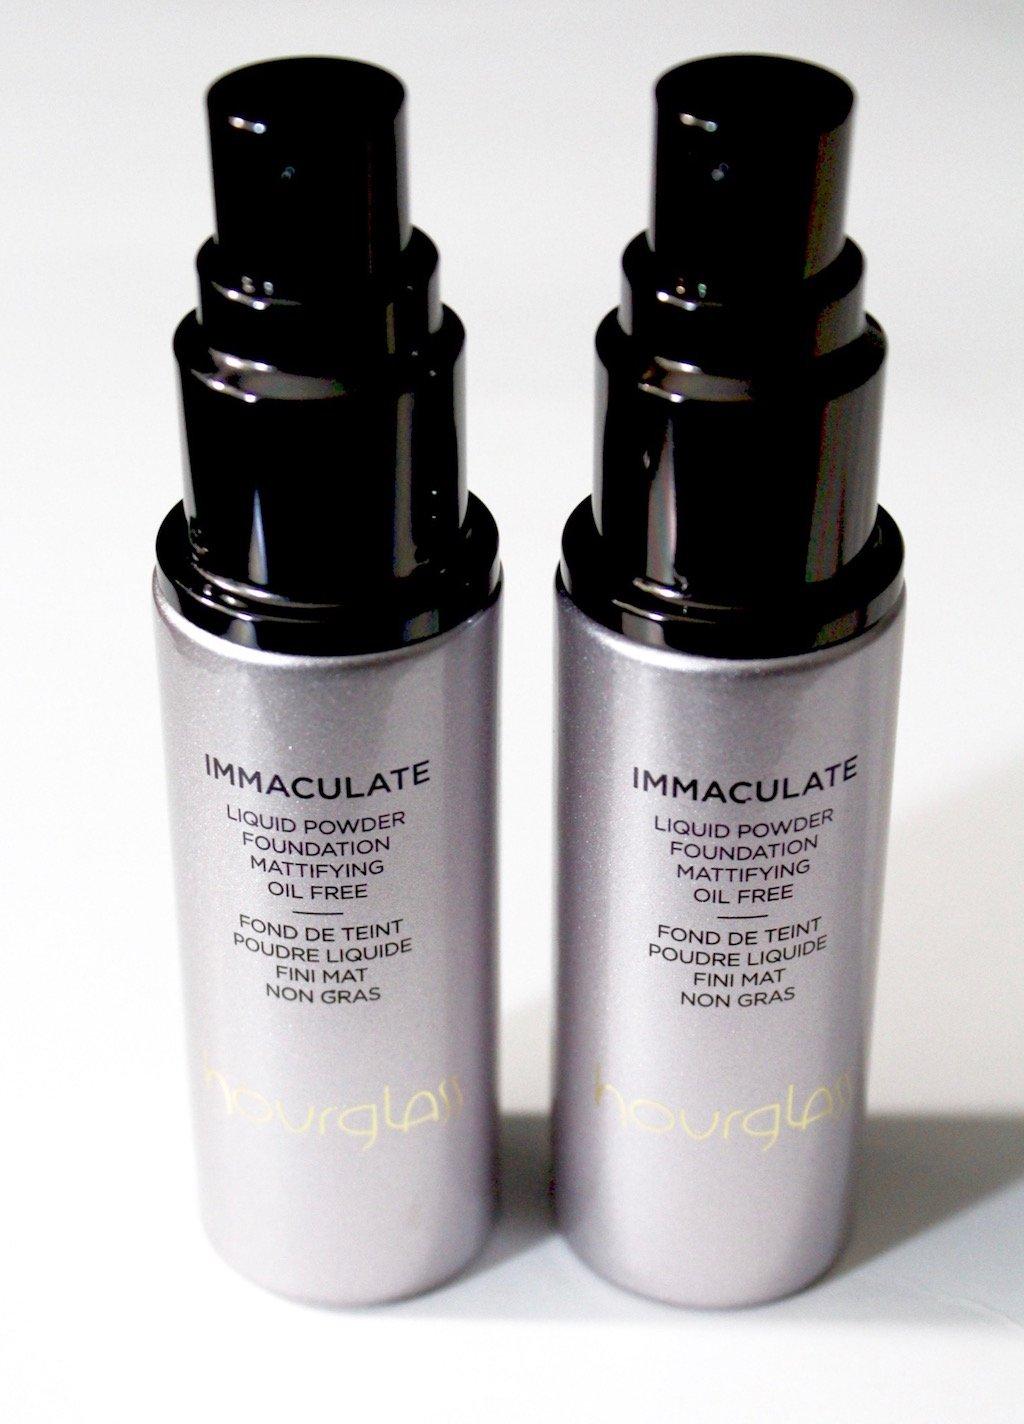 Hourglass Immaculate Liquid Powder Foundation Review